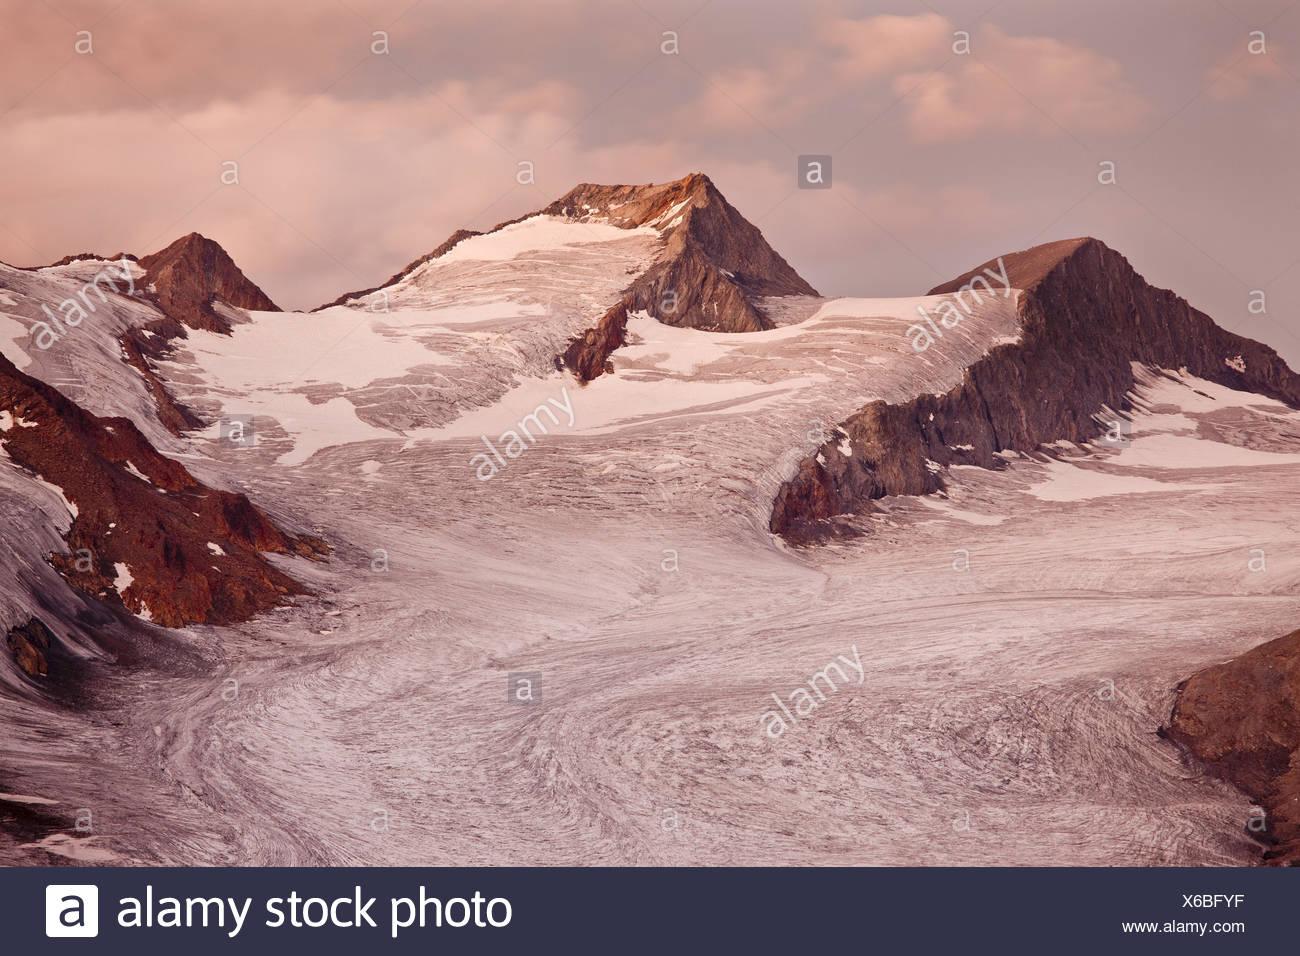 Austria, Tirol, Alpes Ötztaler trasero, oscuridad, glaciar, Imagen De Stock